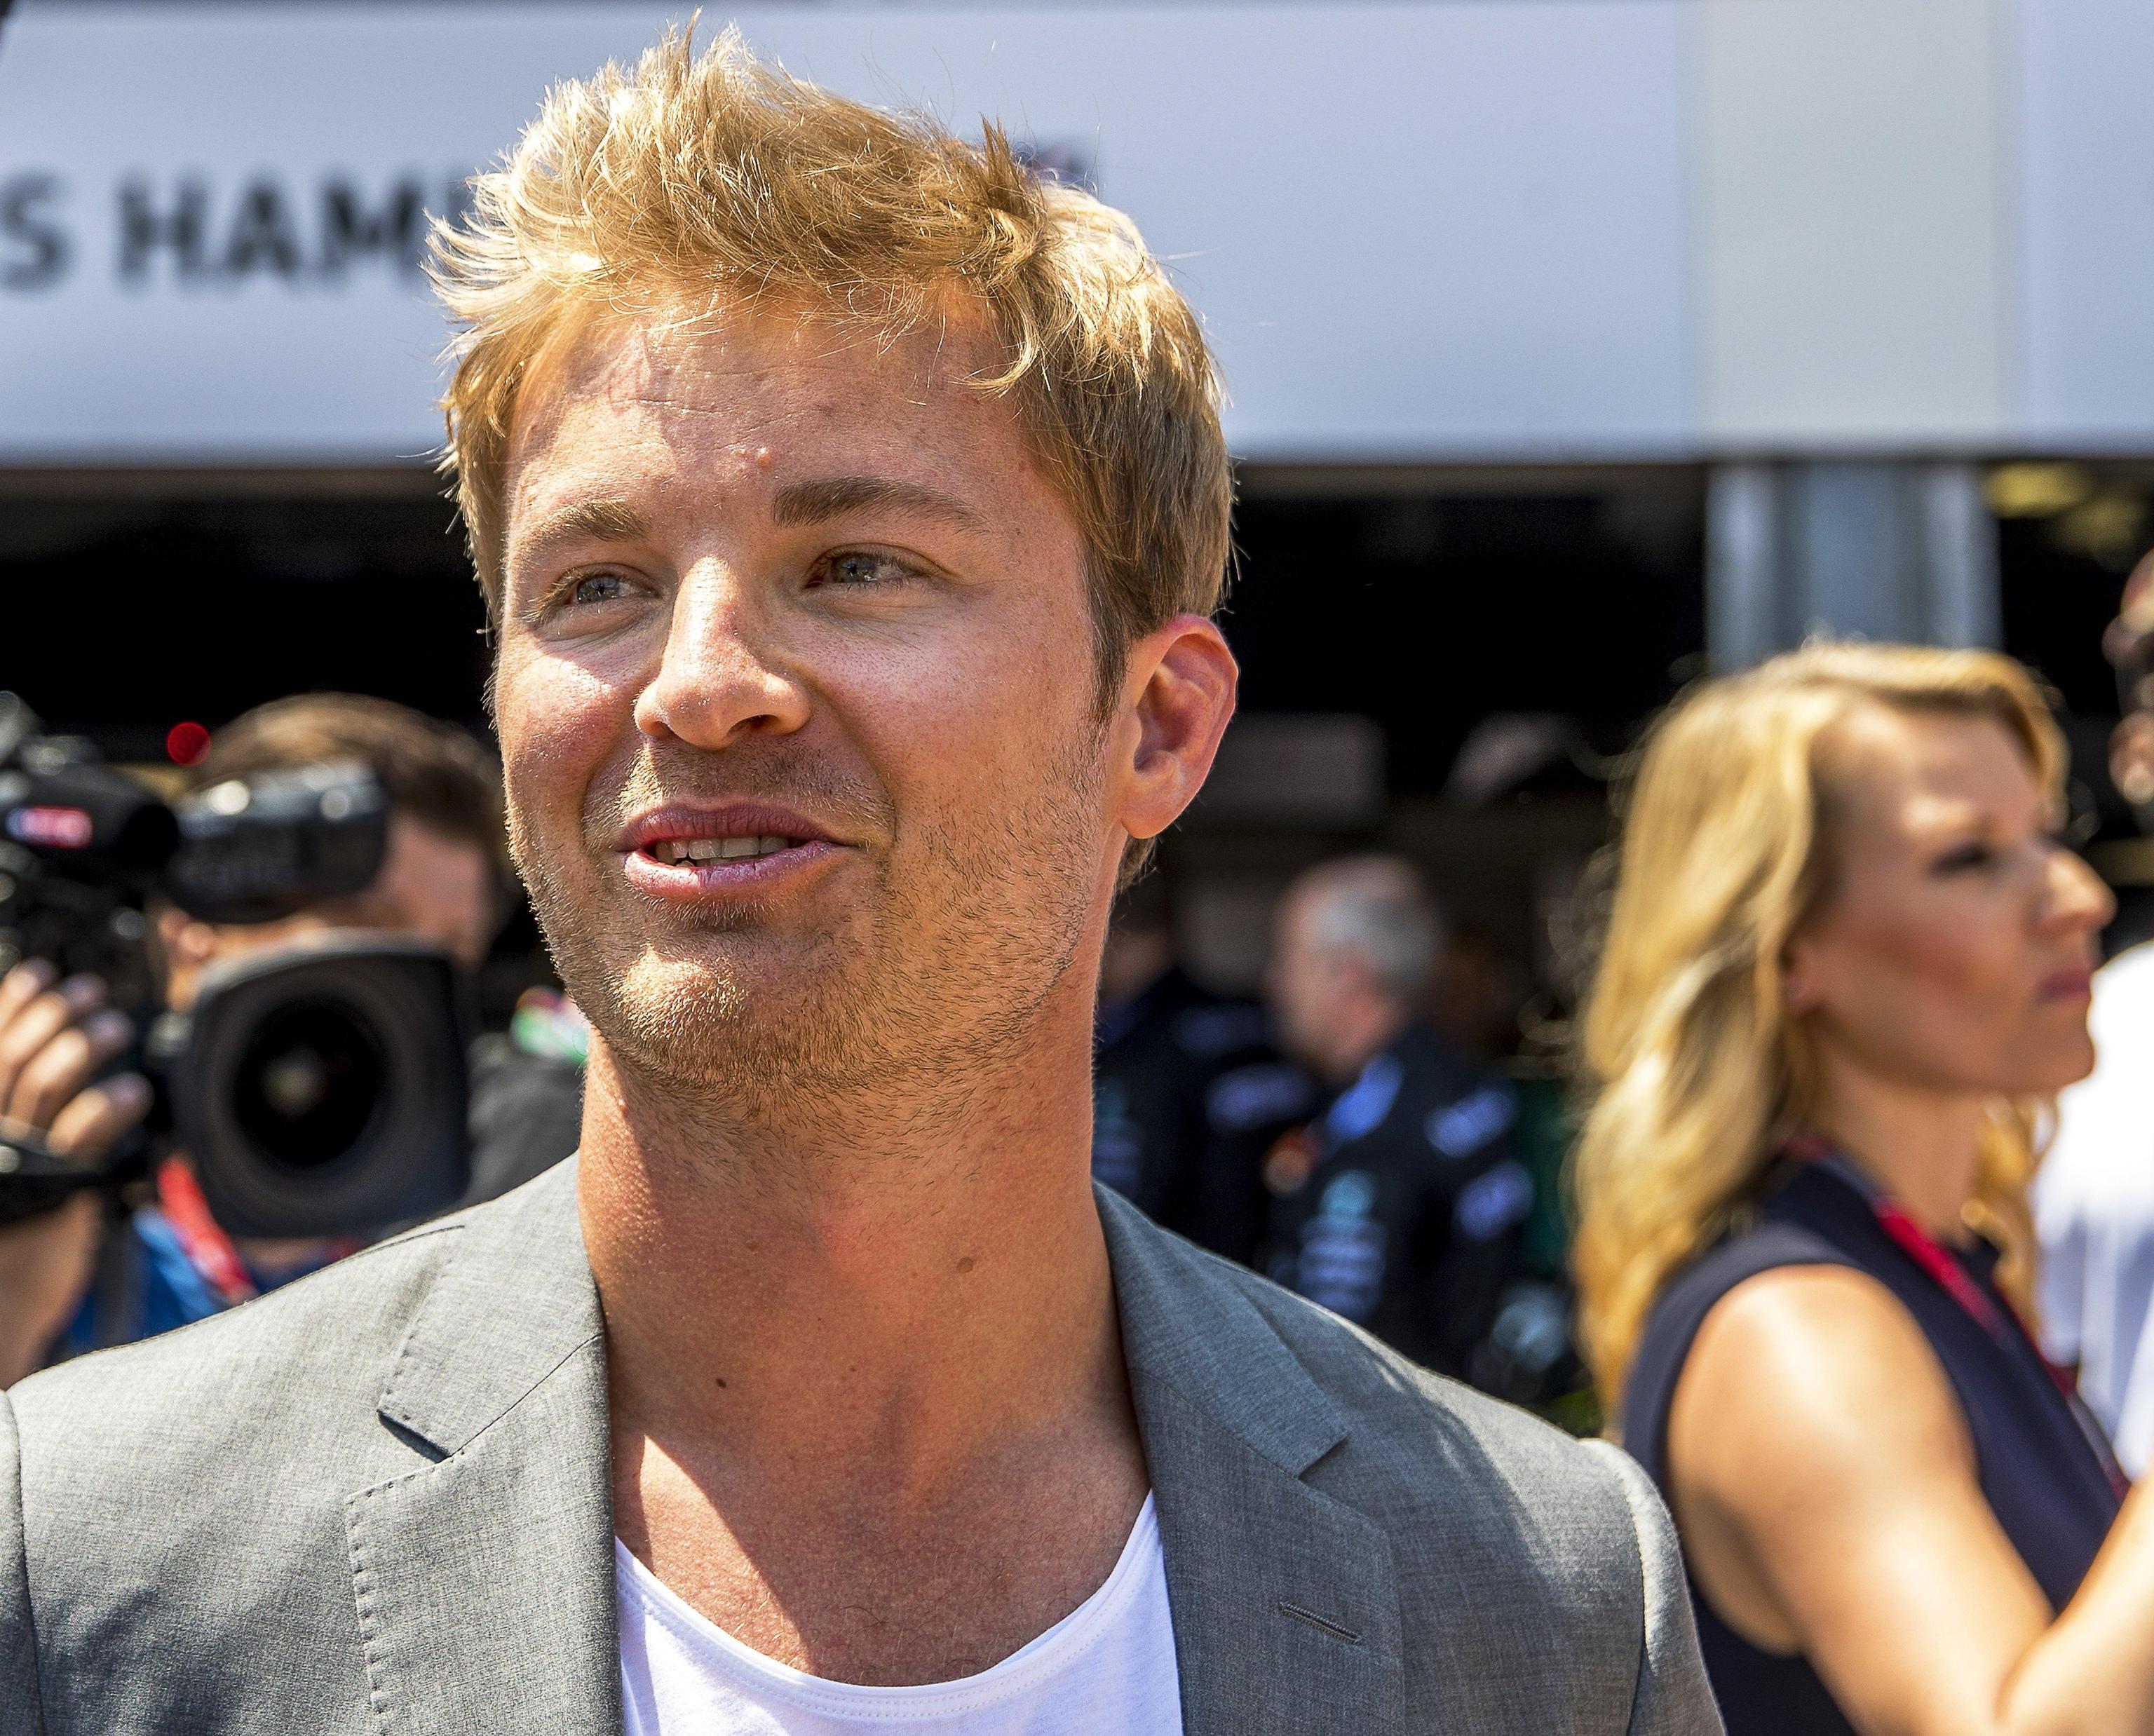 Nico-Rosberg classifica piloti più ricchi di sempre